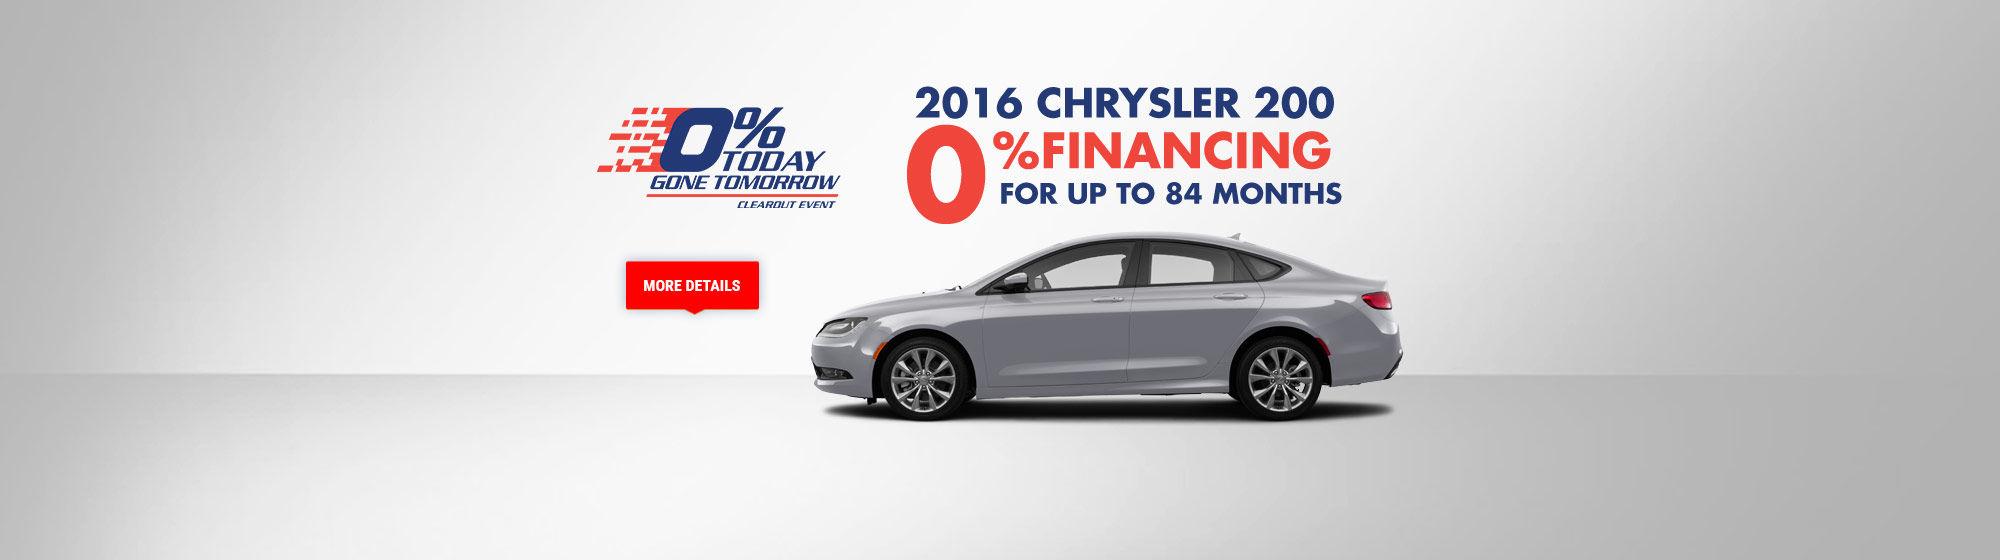 0% today gone tomorrow - Chrysler